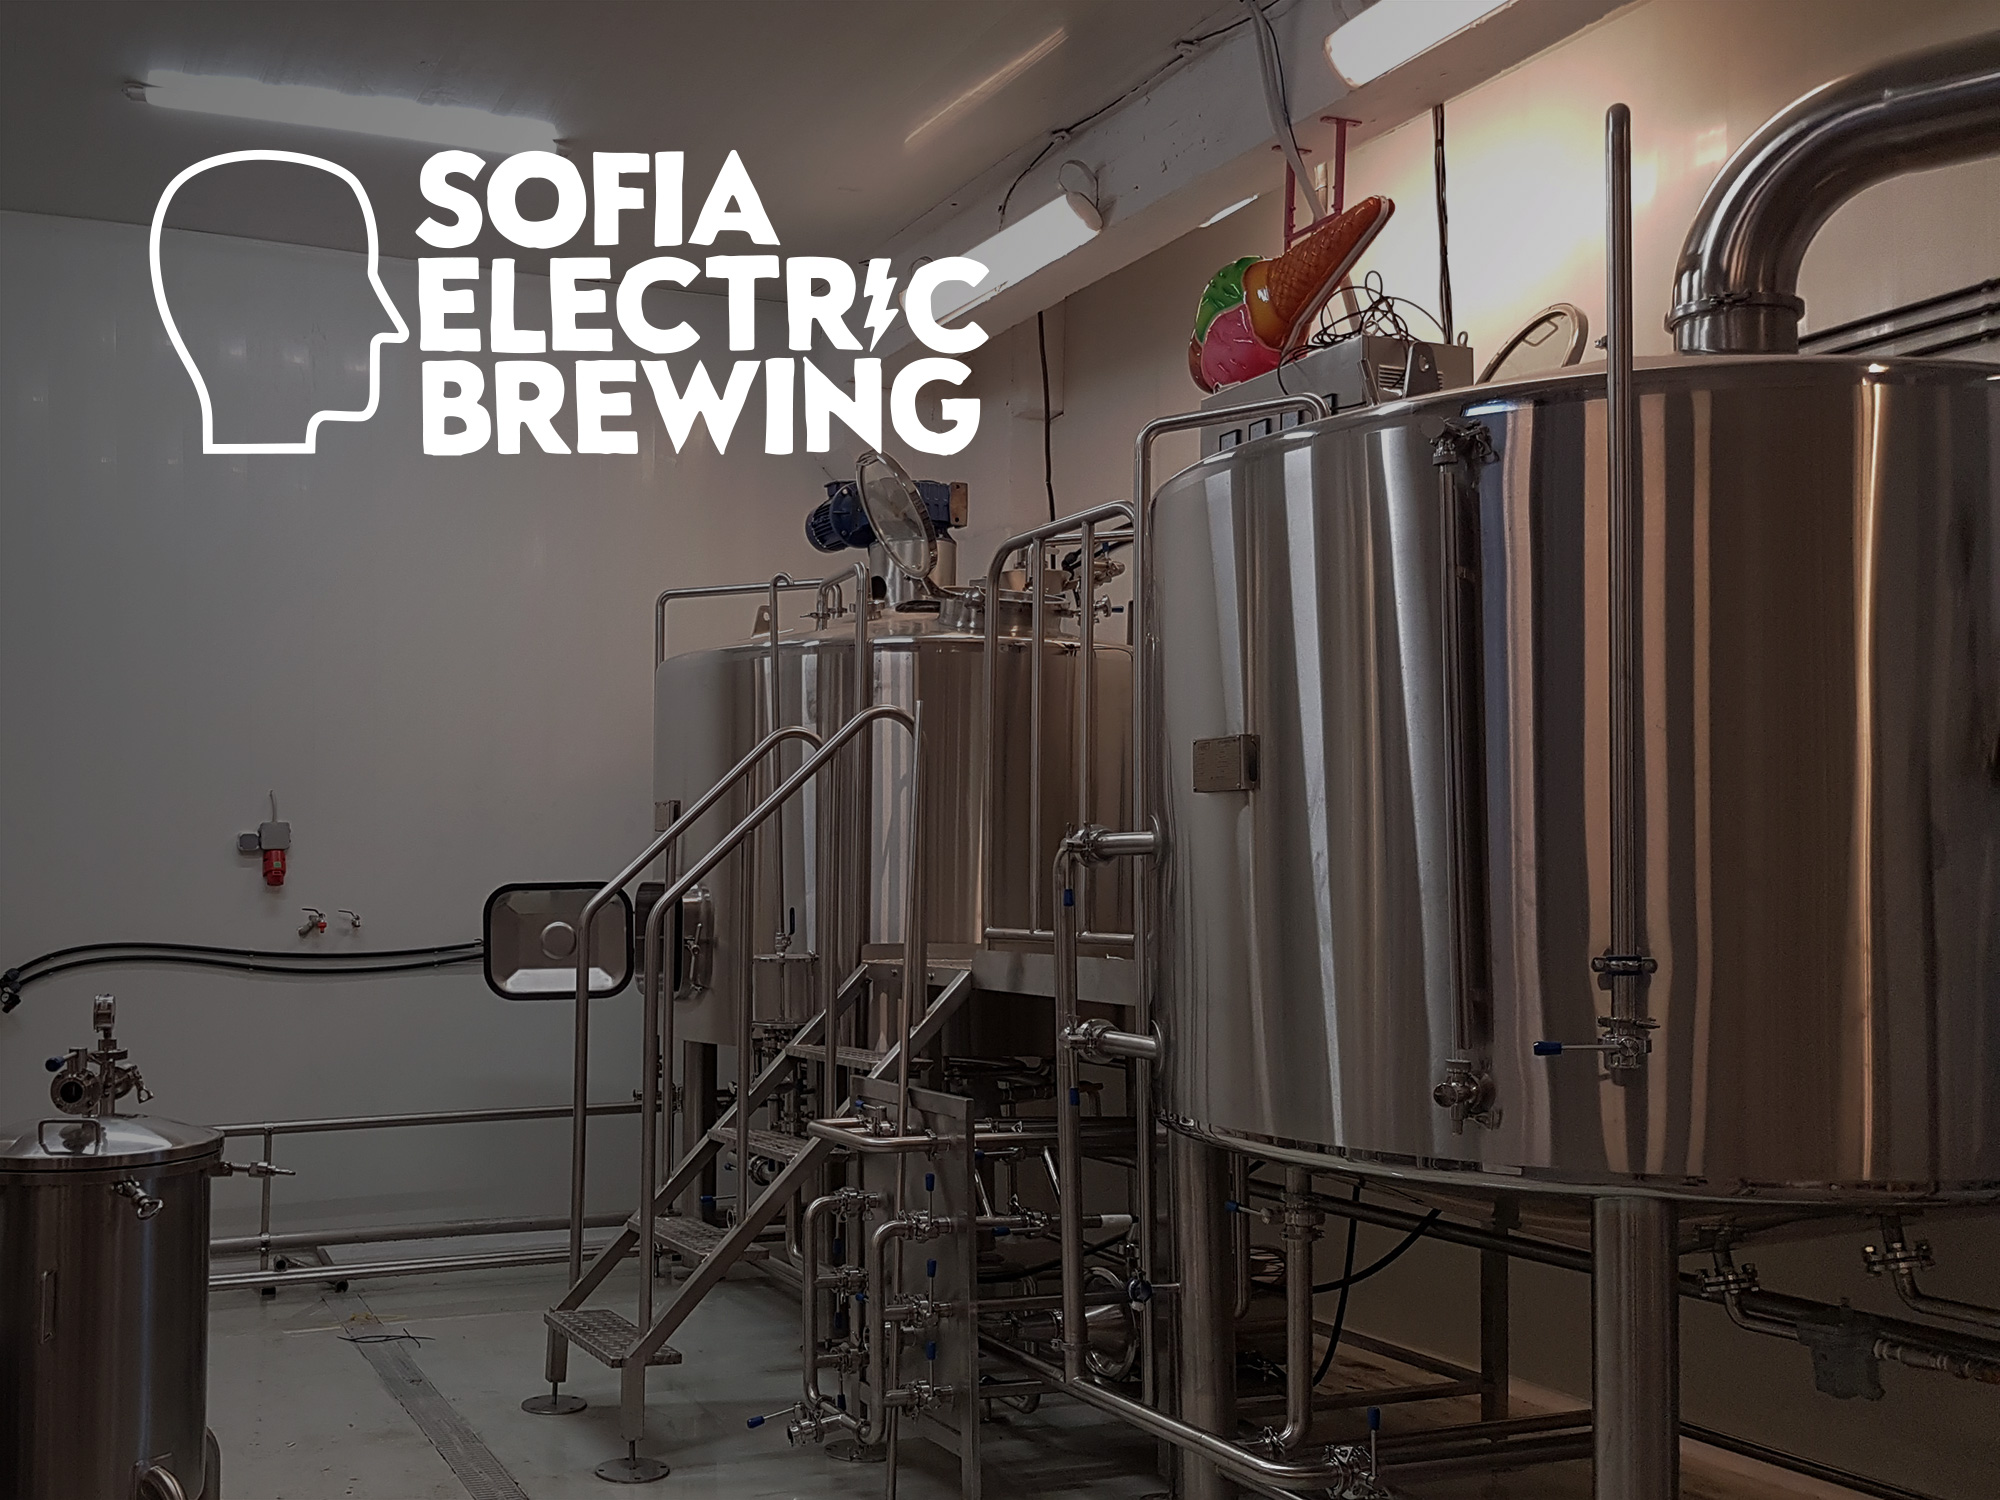 Sofia Electric Brewing